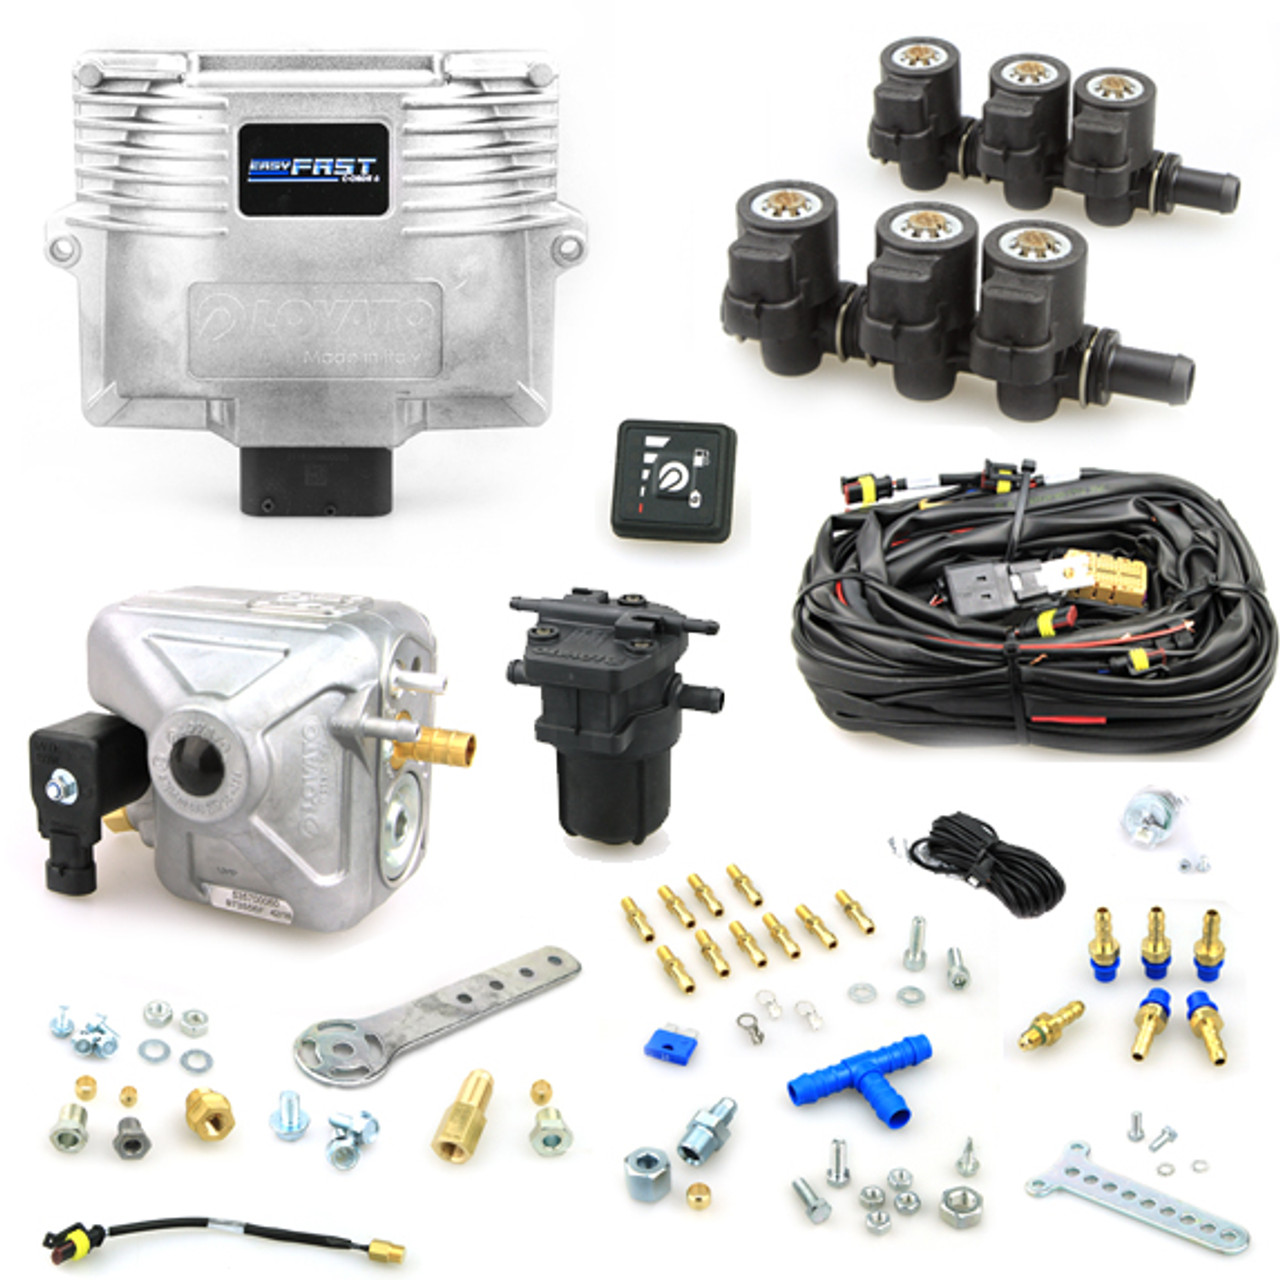 6 cylinder autogas kit lovato fast c obdii rh lpgshop co uk Wiring Diagram Symbols 3-Way Switch Wiring Diagram